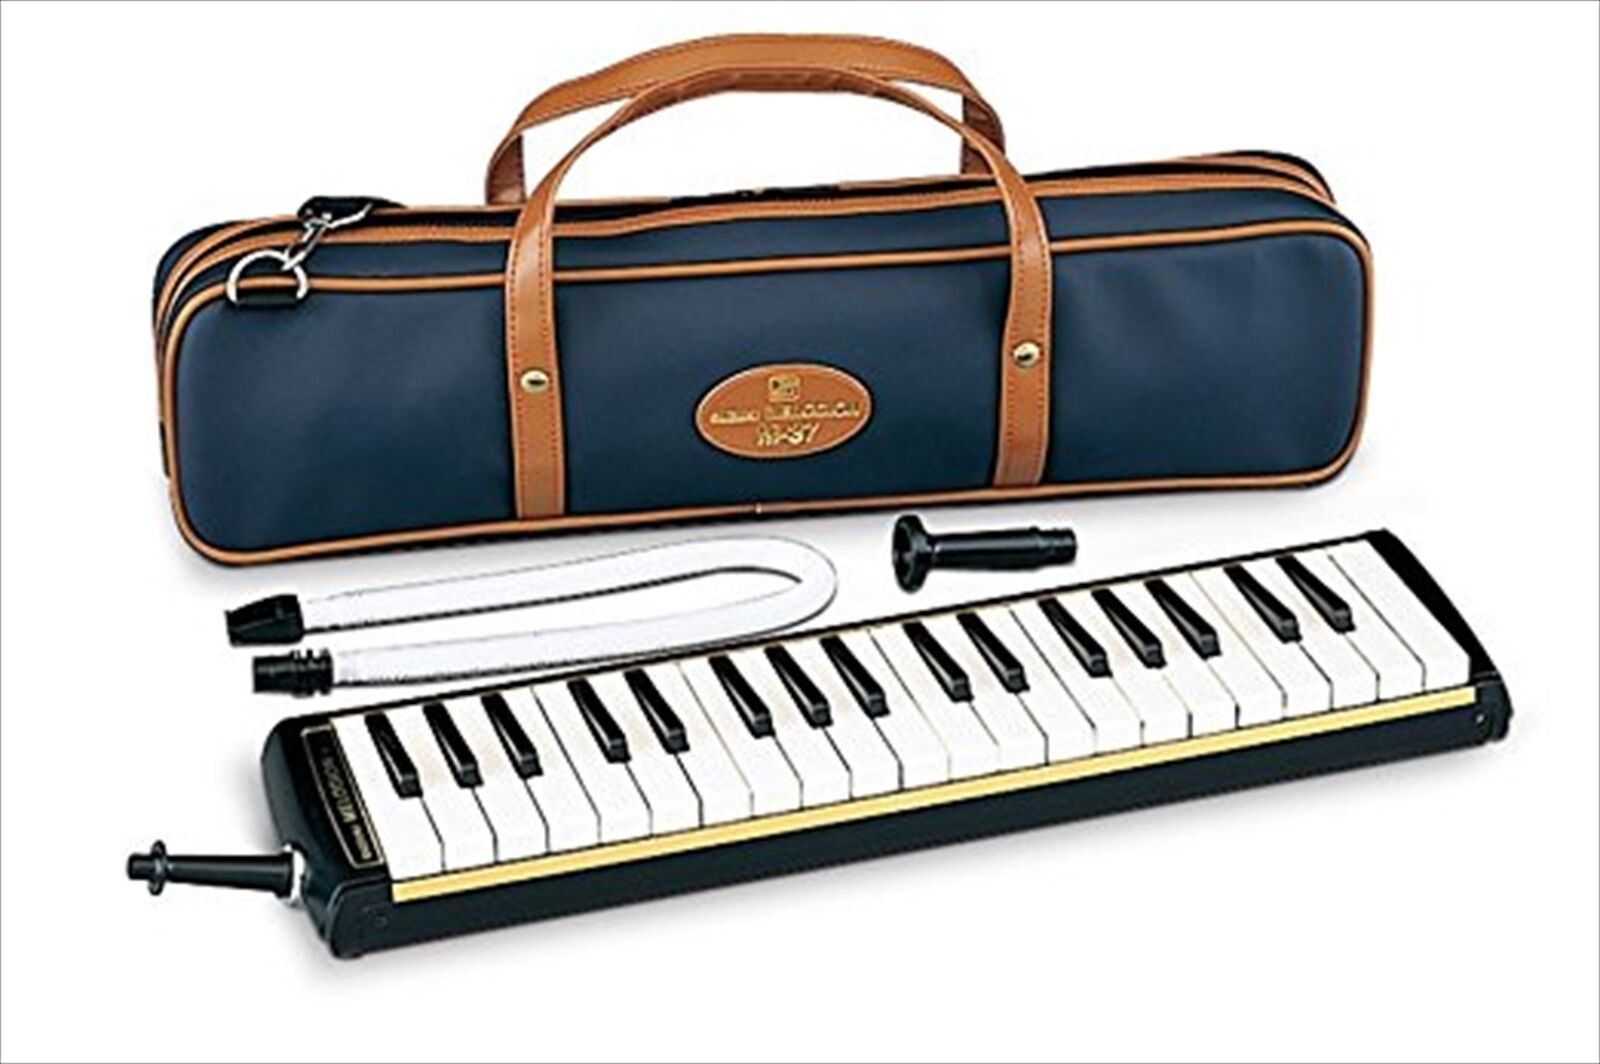 SUZUKI MELODION Alto M-37C Keyboard Harmonica Pianica with Soft case F/S SAL NEW